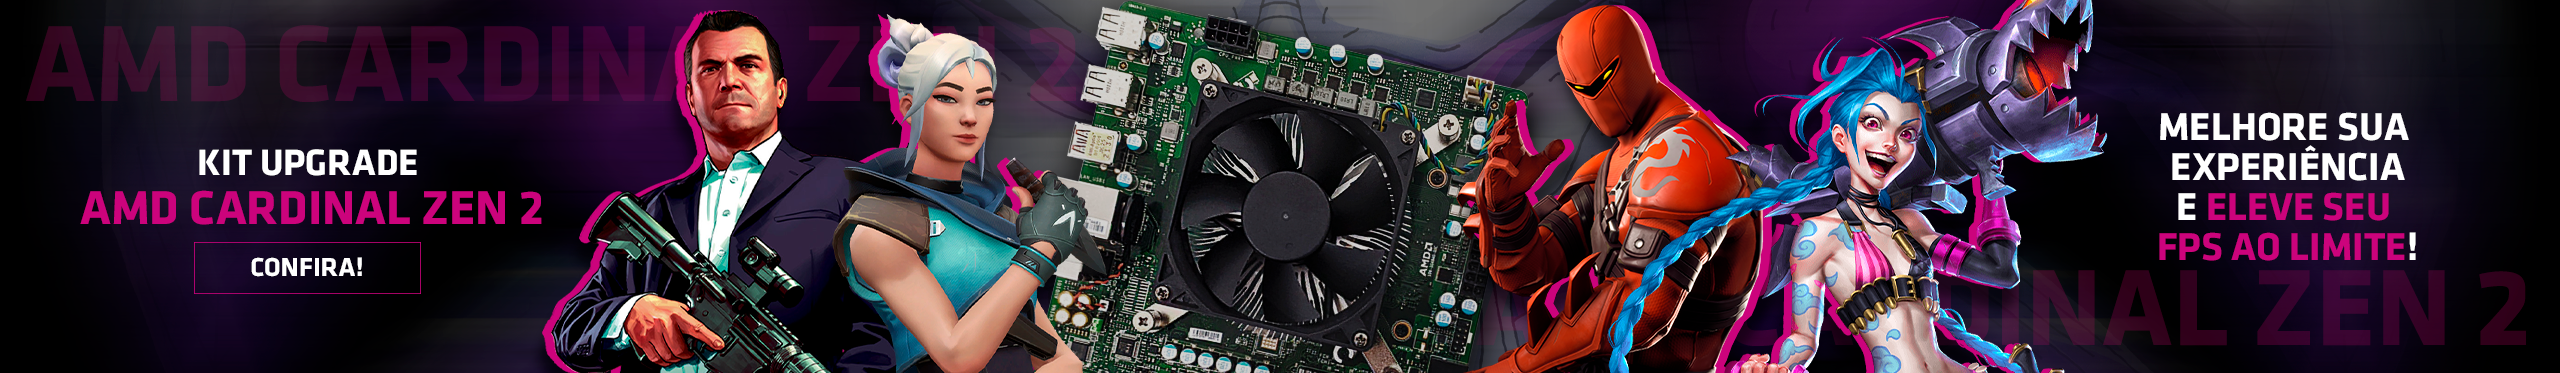 Kit upgrade - AMD CARDINAL ZEN 2